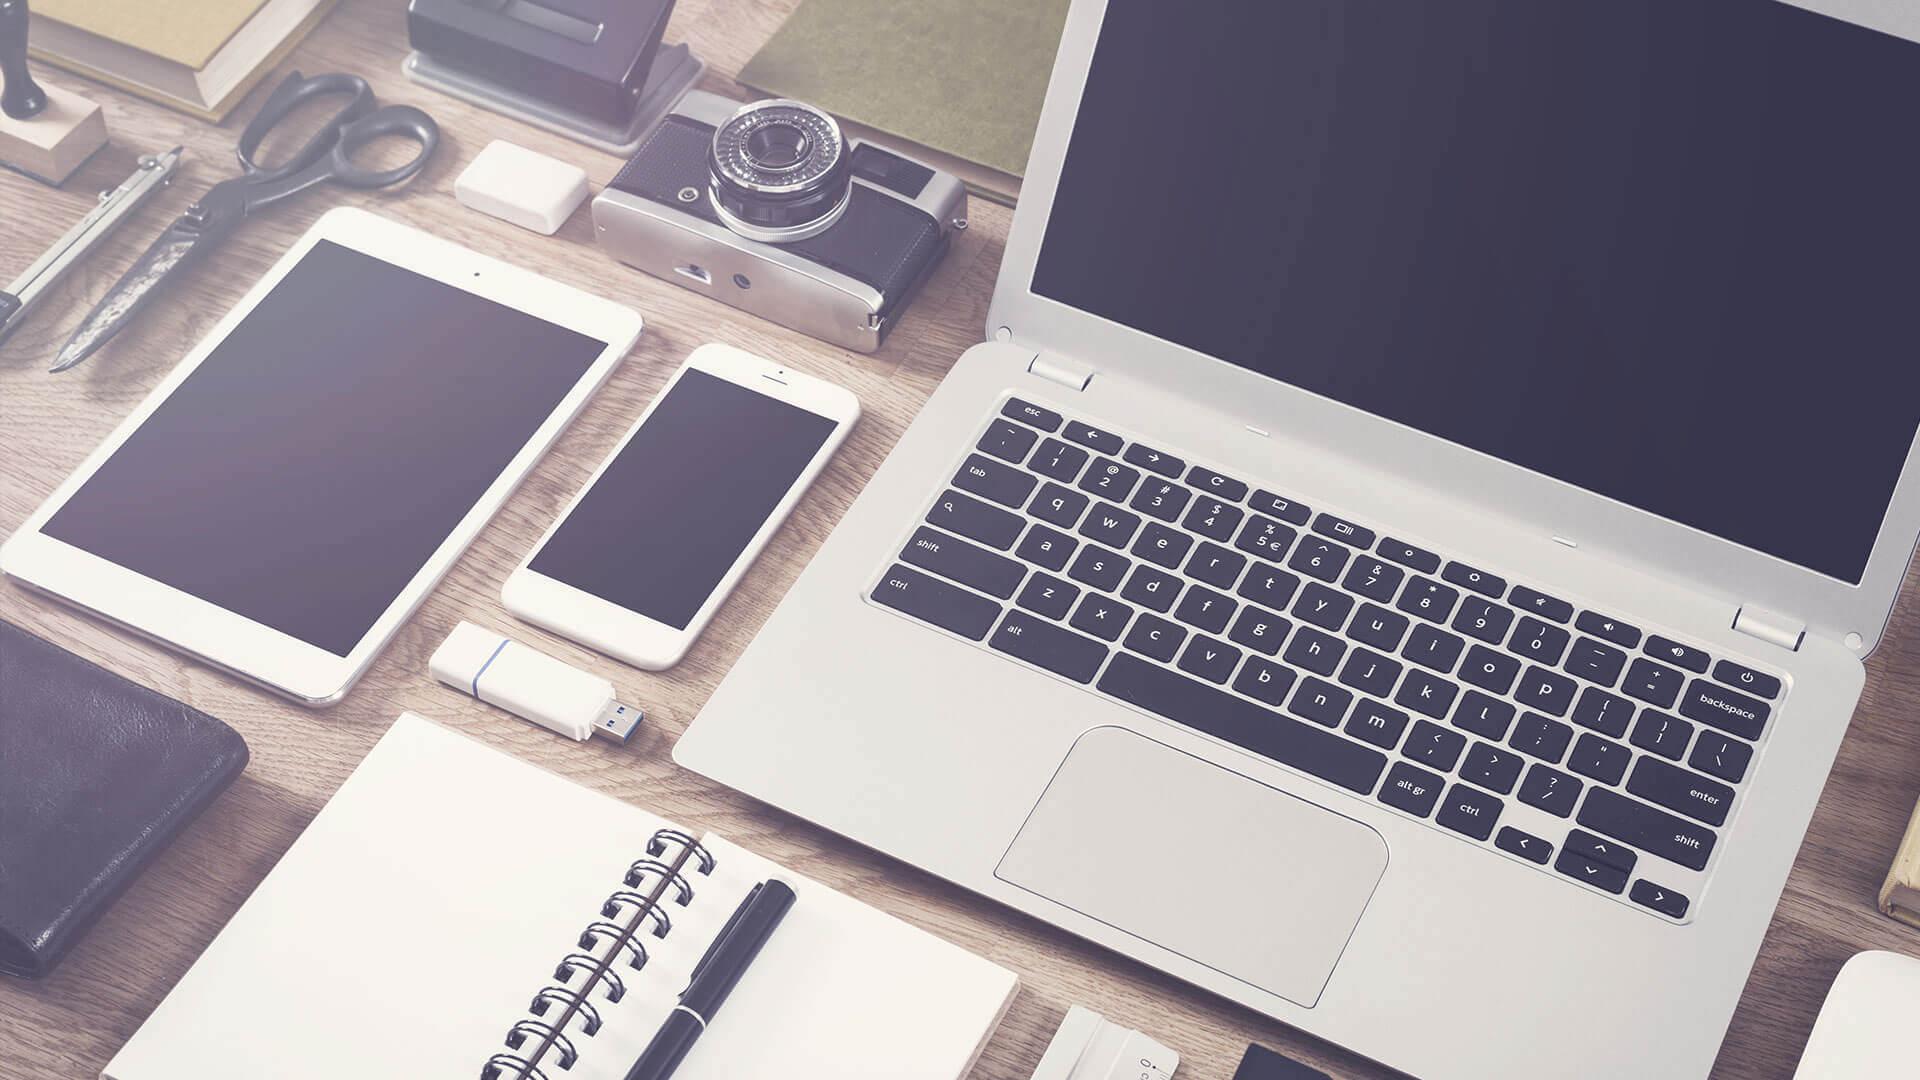 Webshop - responsive mobile usability